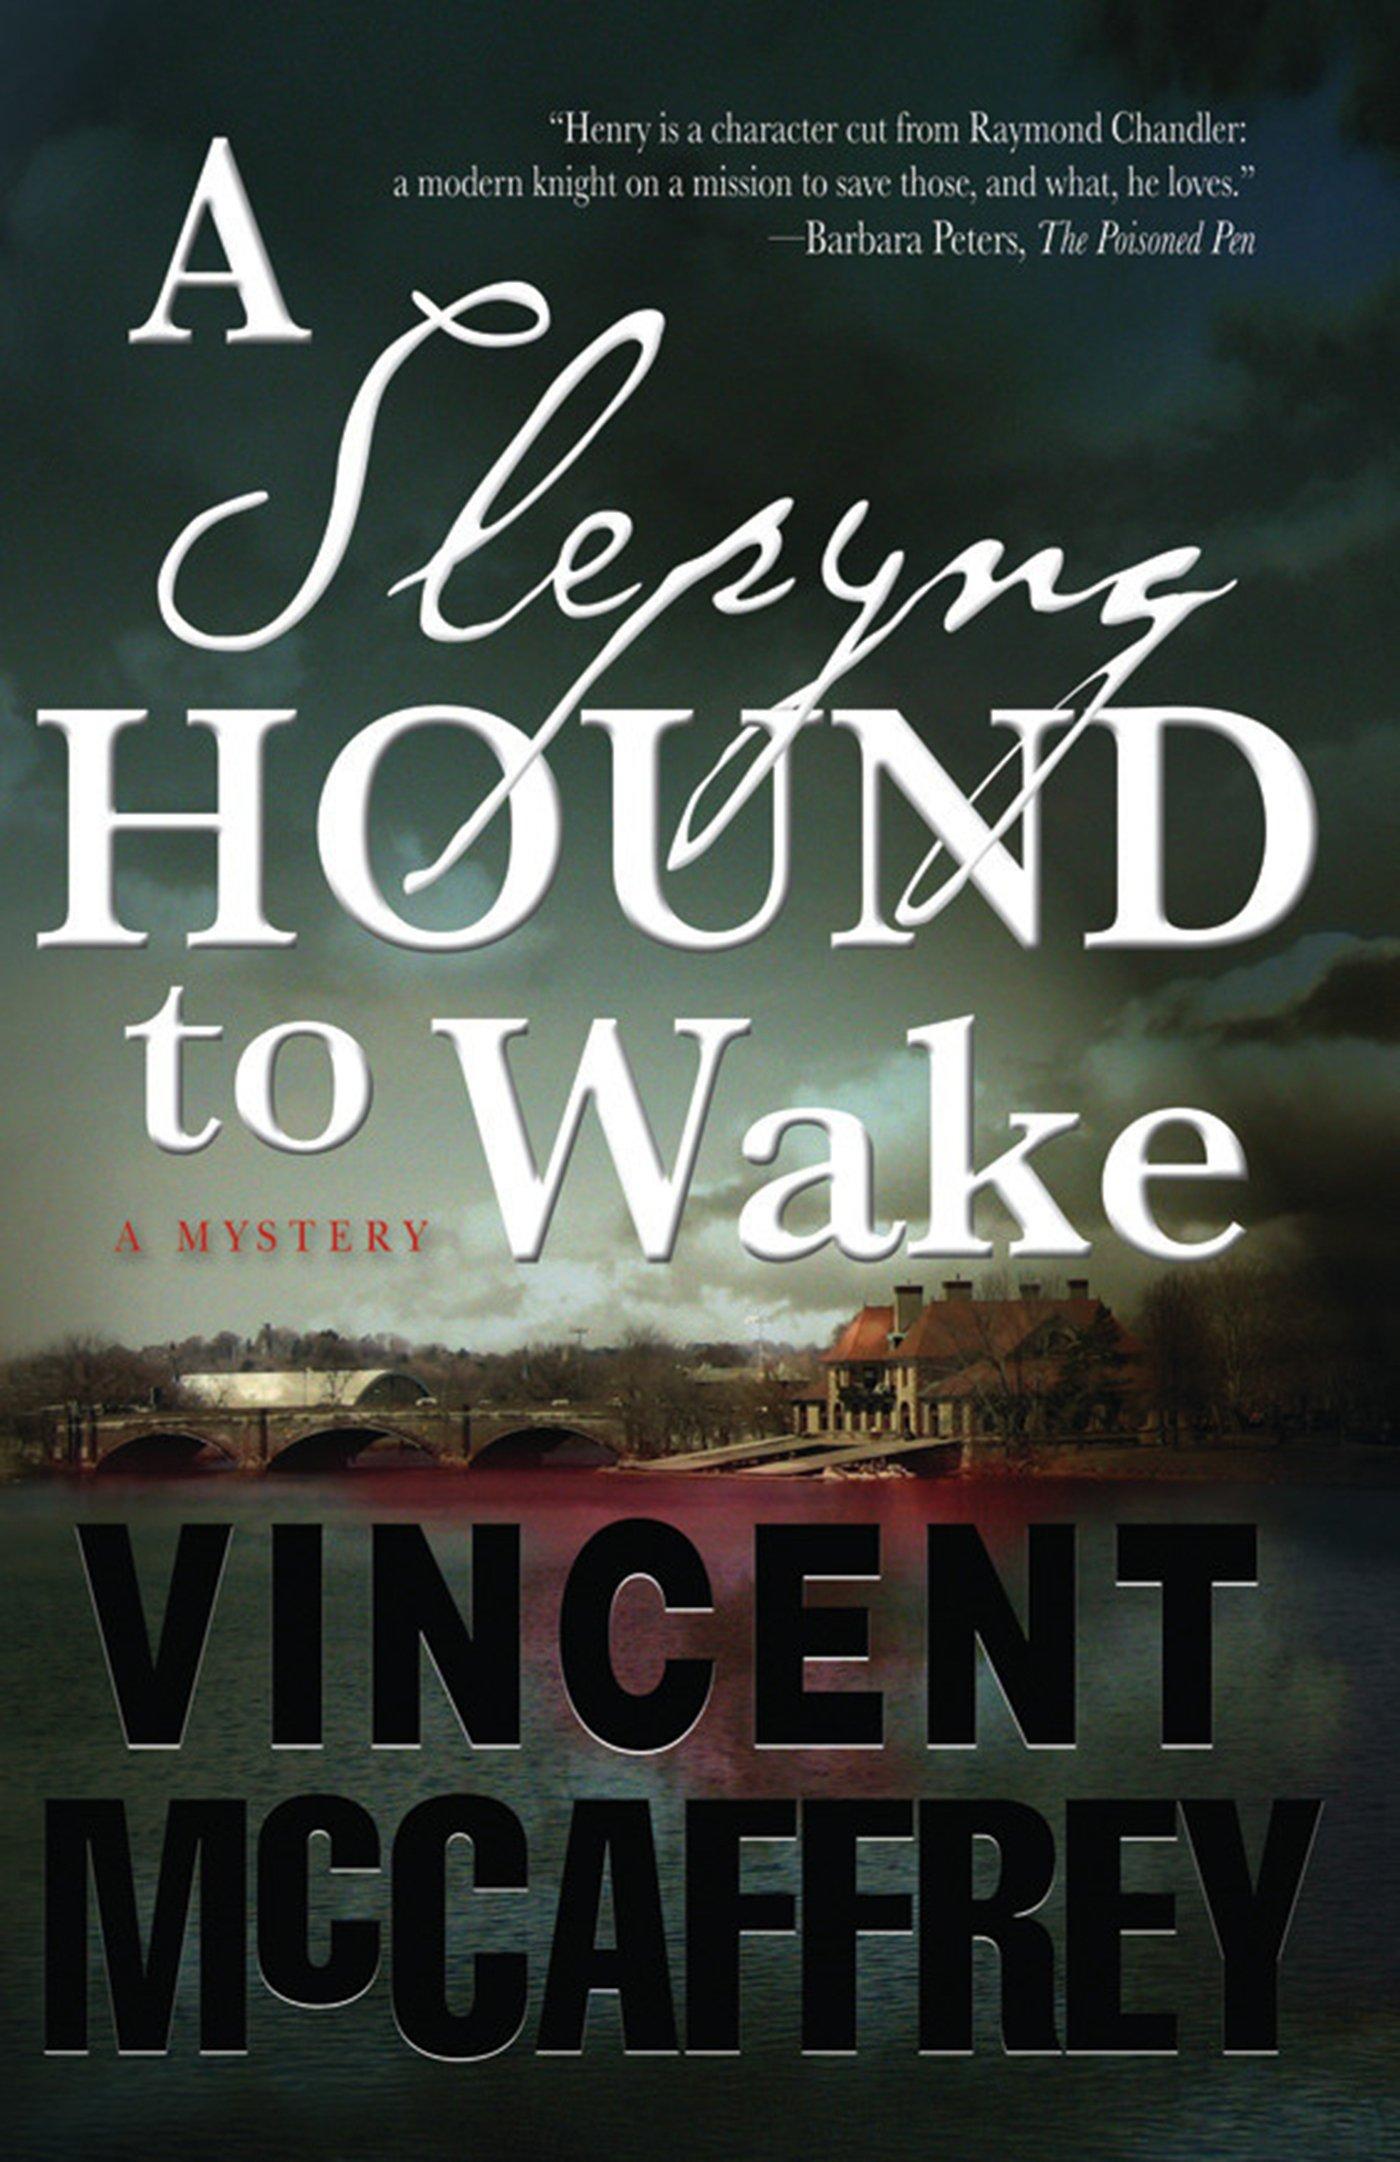 A Slepyng Hound to Wake: a novel